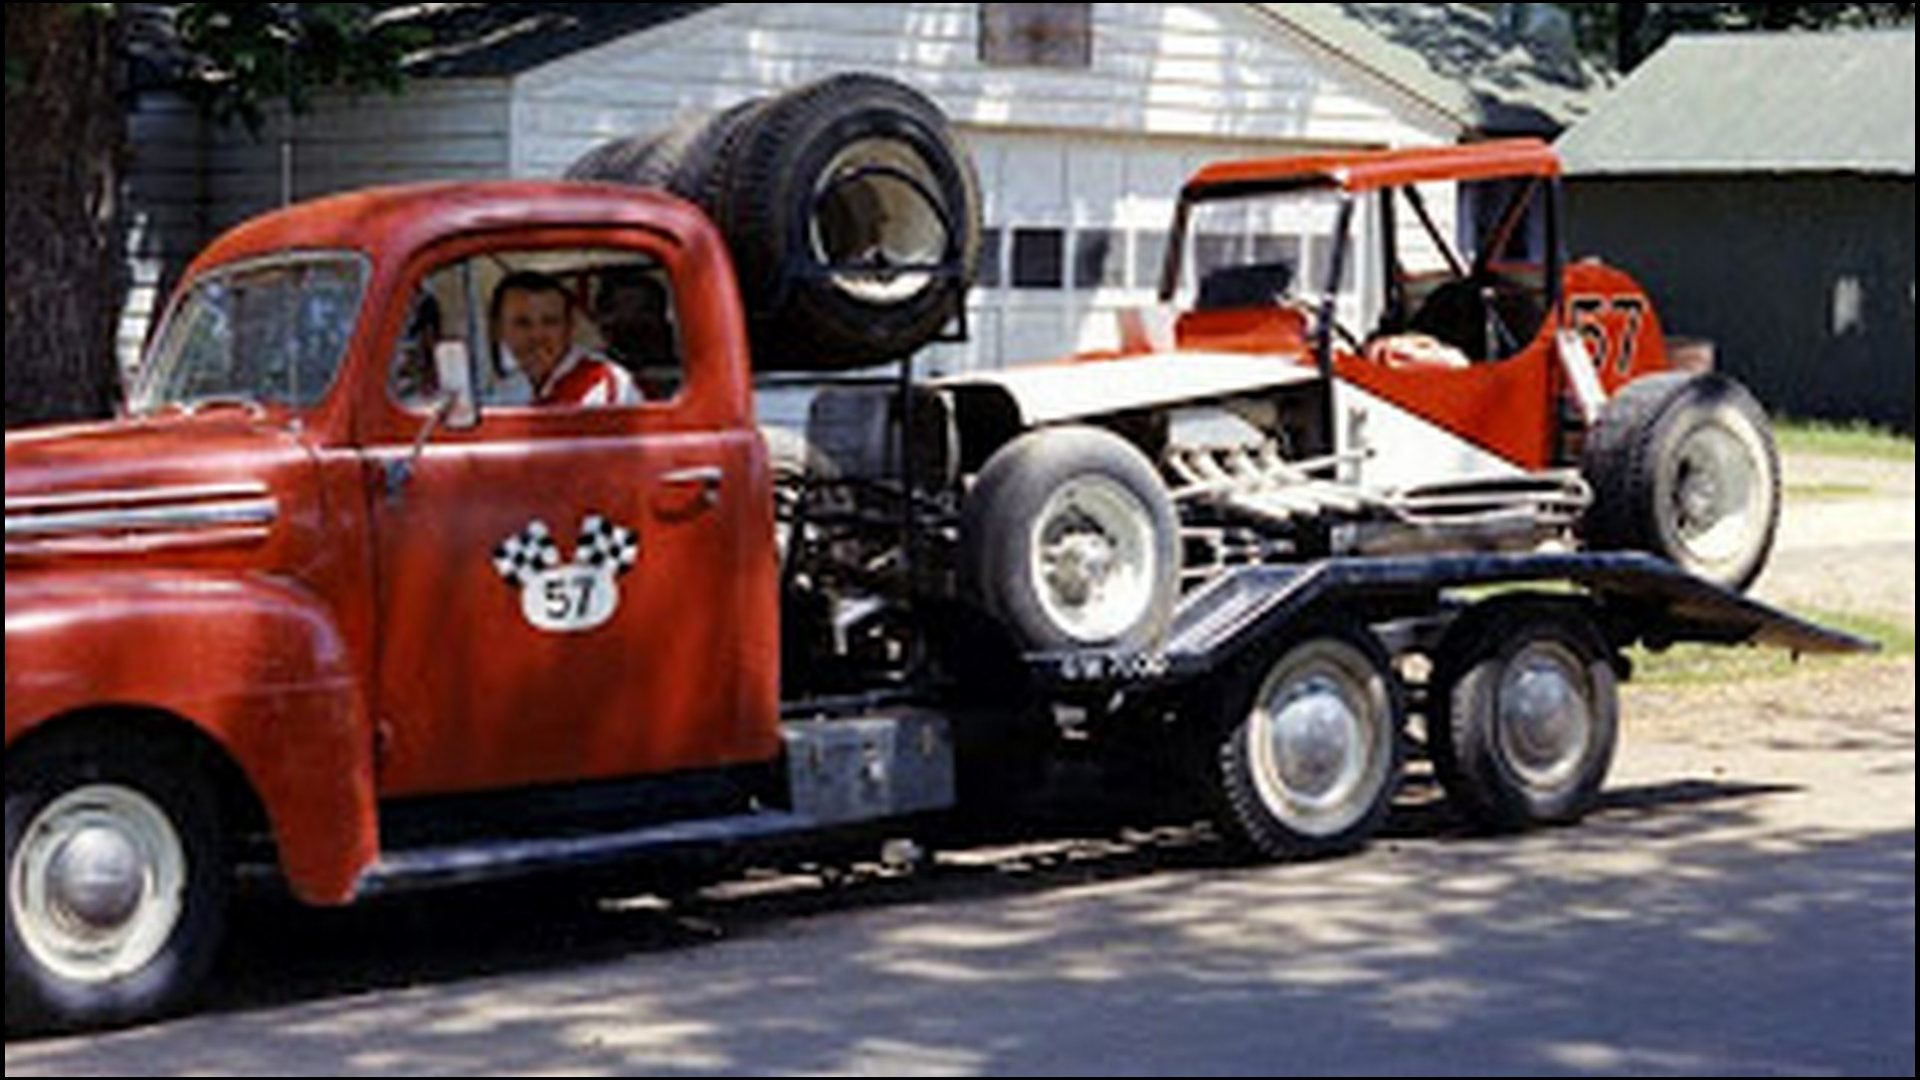 Barry in truck & race car on hauler